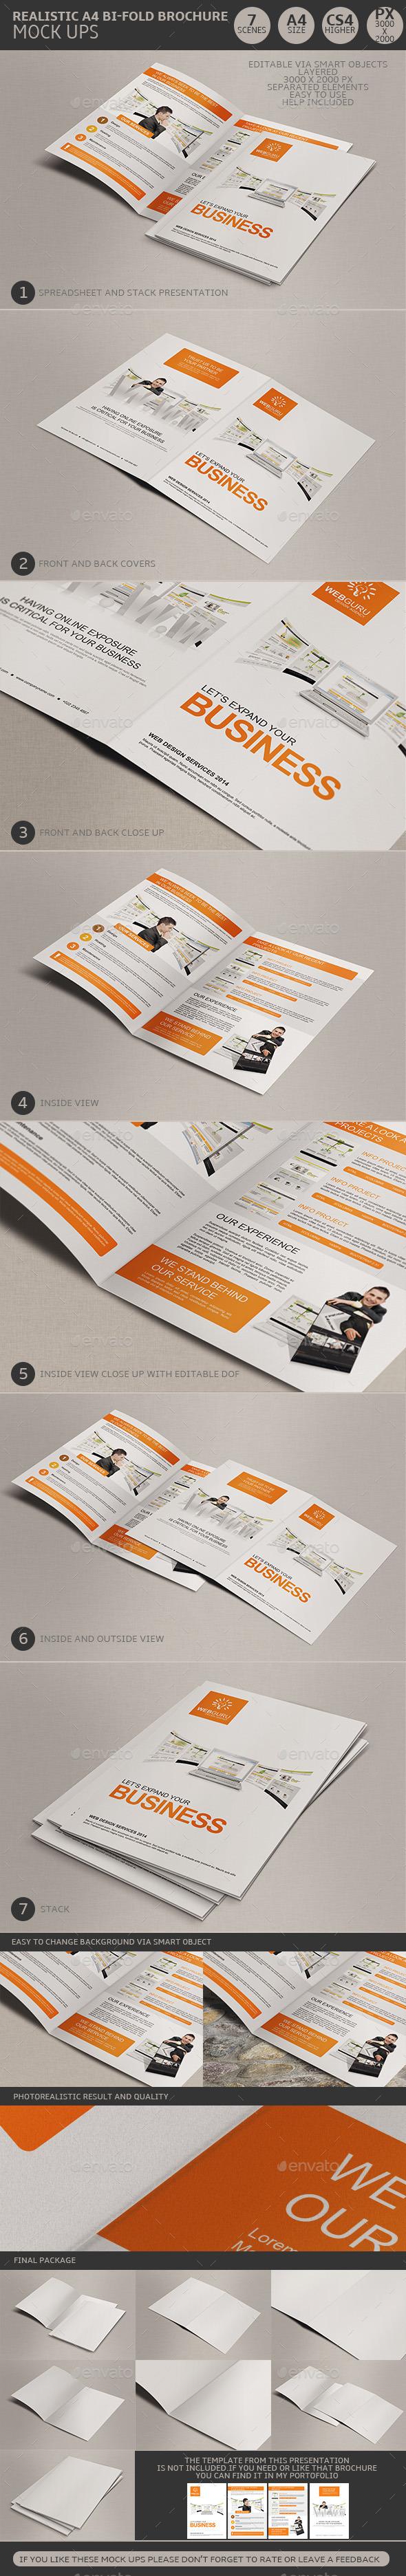 Realistic A4 Bi Fold Brochure Mock Ups